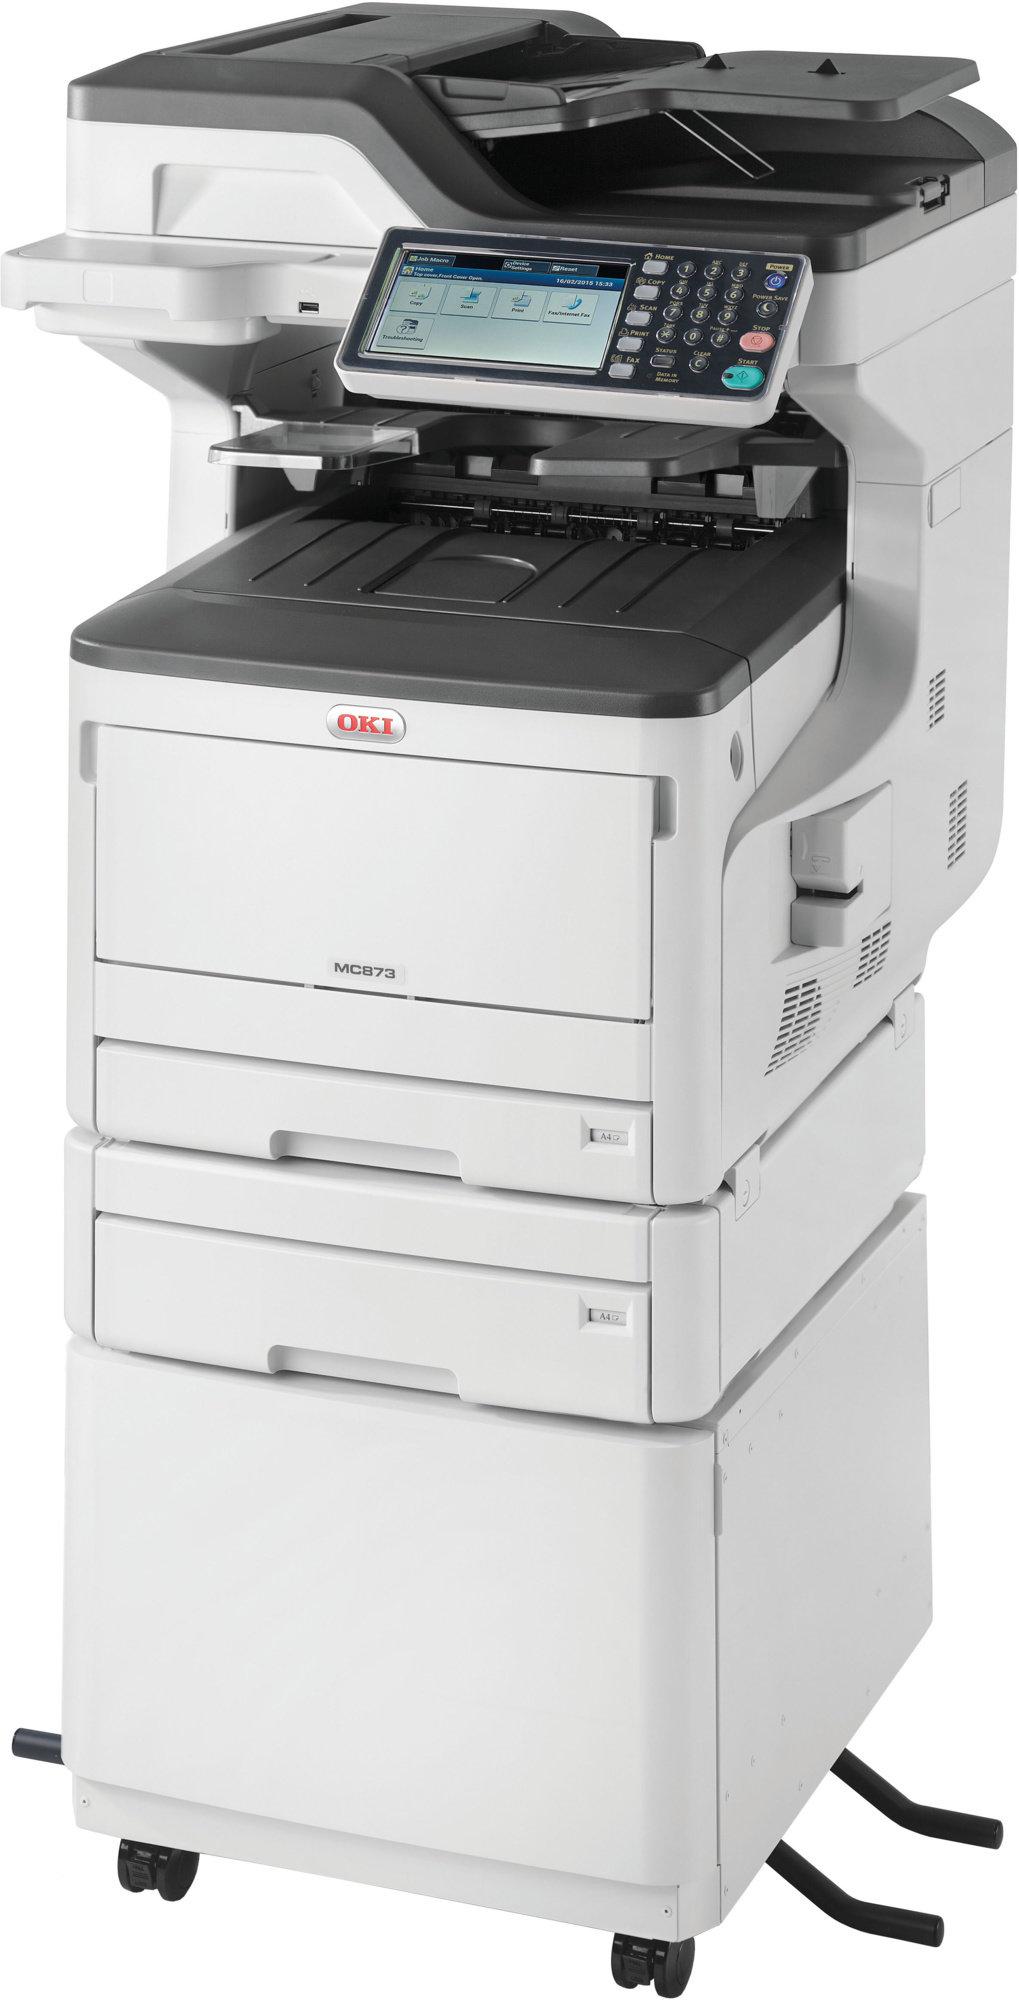 OKI MC873dnct A3 35/35 ppm ProQ2400 dpi PCL6/PS3,USB 2.0,LAN (Print/Scan/Copy/Fax)